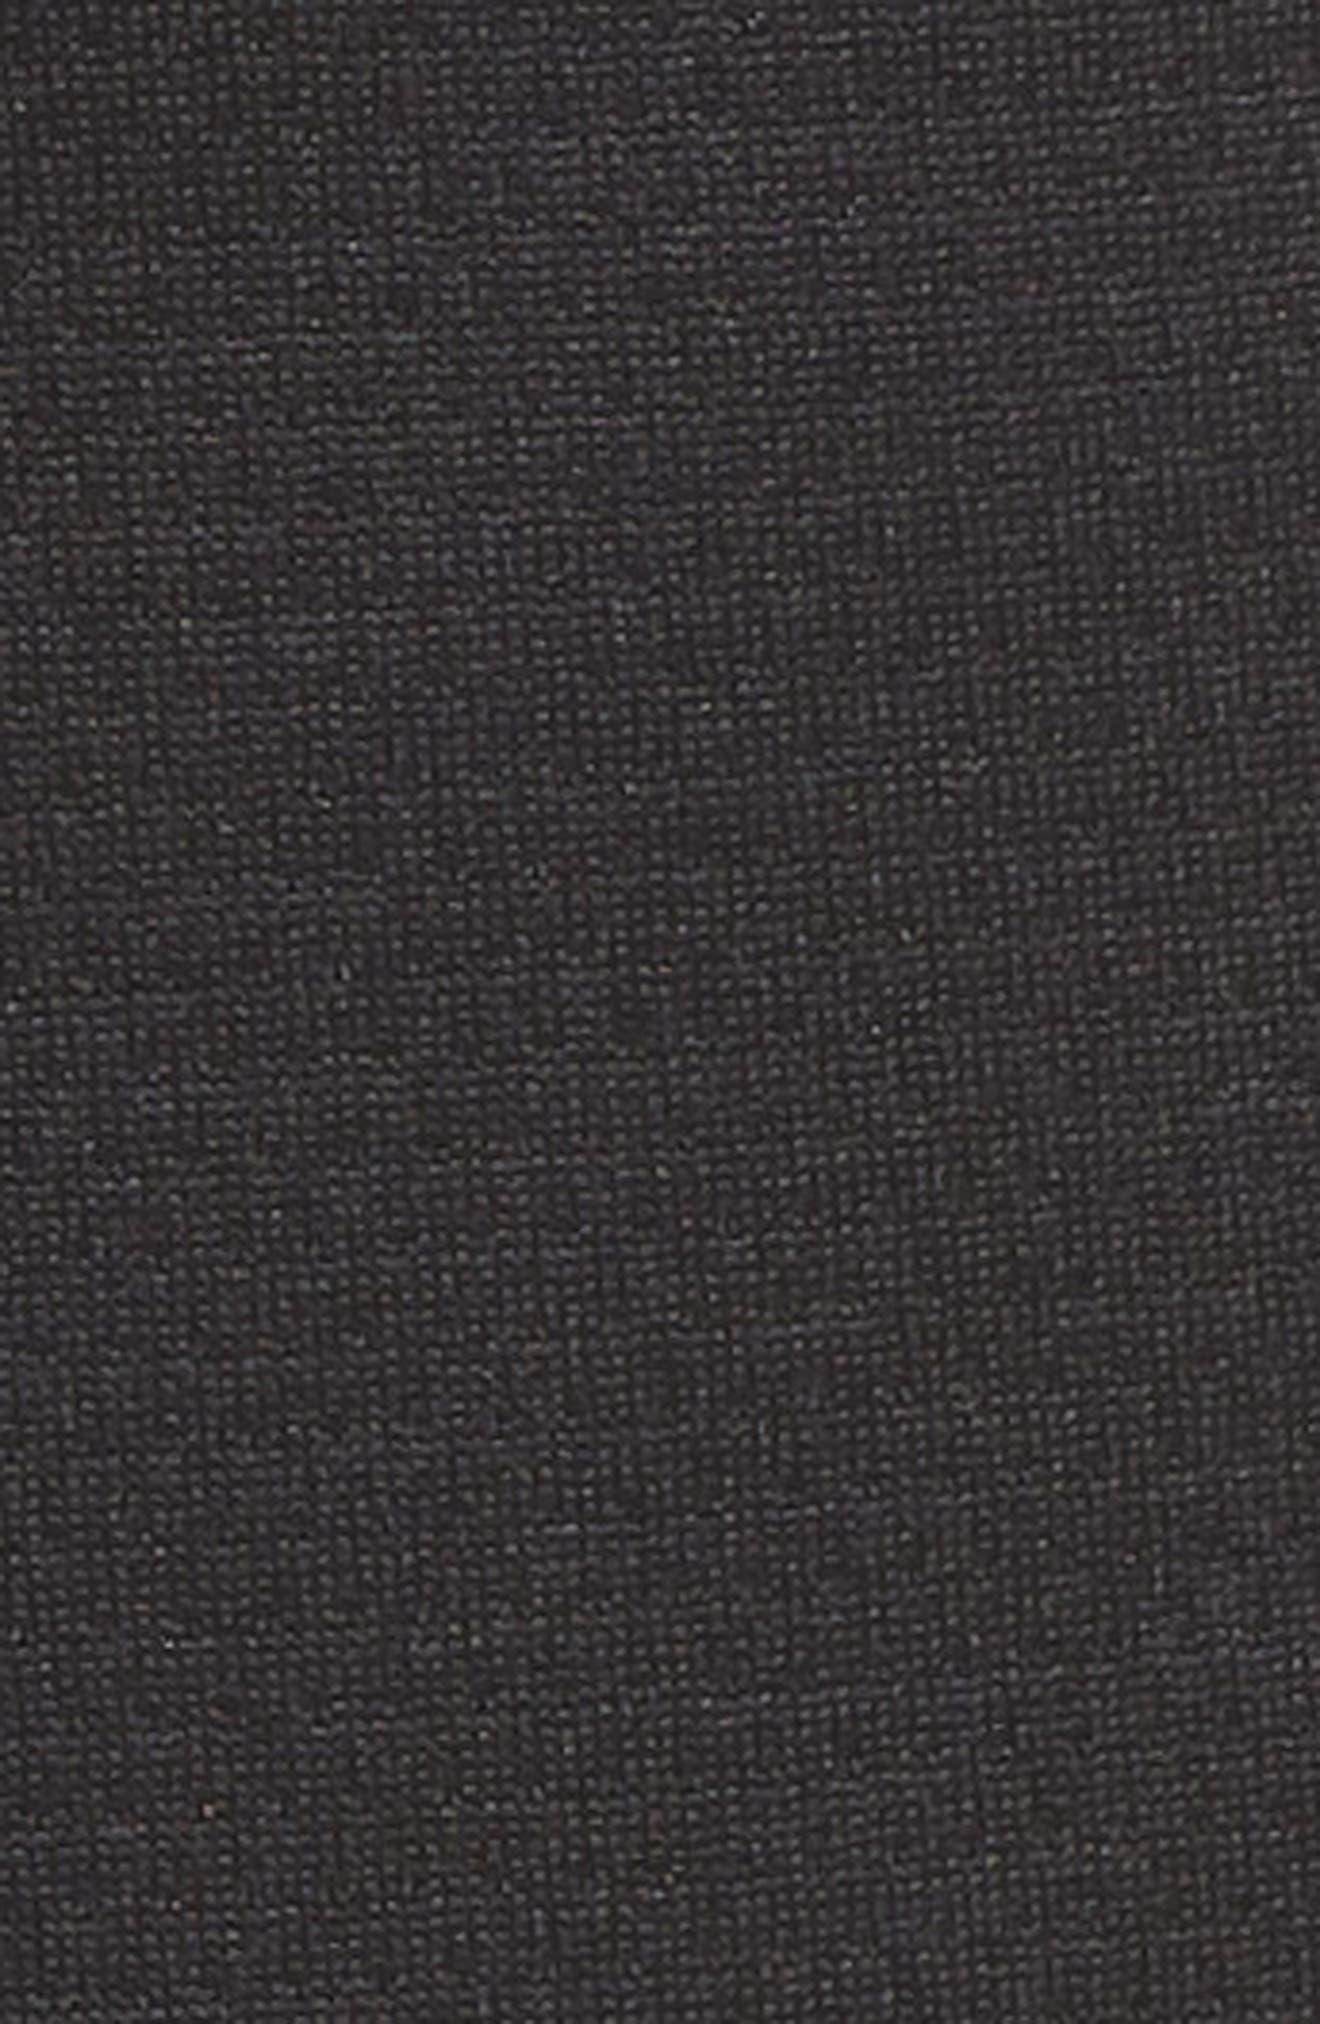 Sportswear Tech Fleece Short,                             Alternate thumbnail 6, color,                             Black/ Black